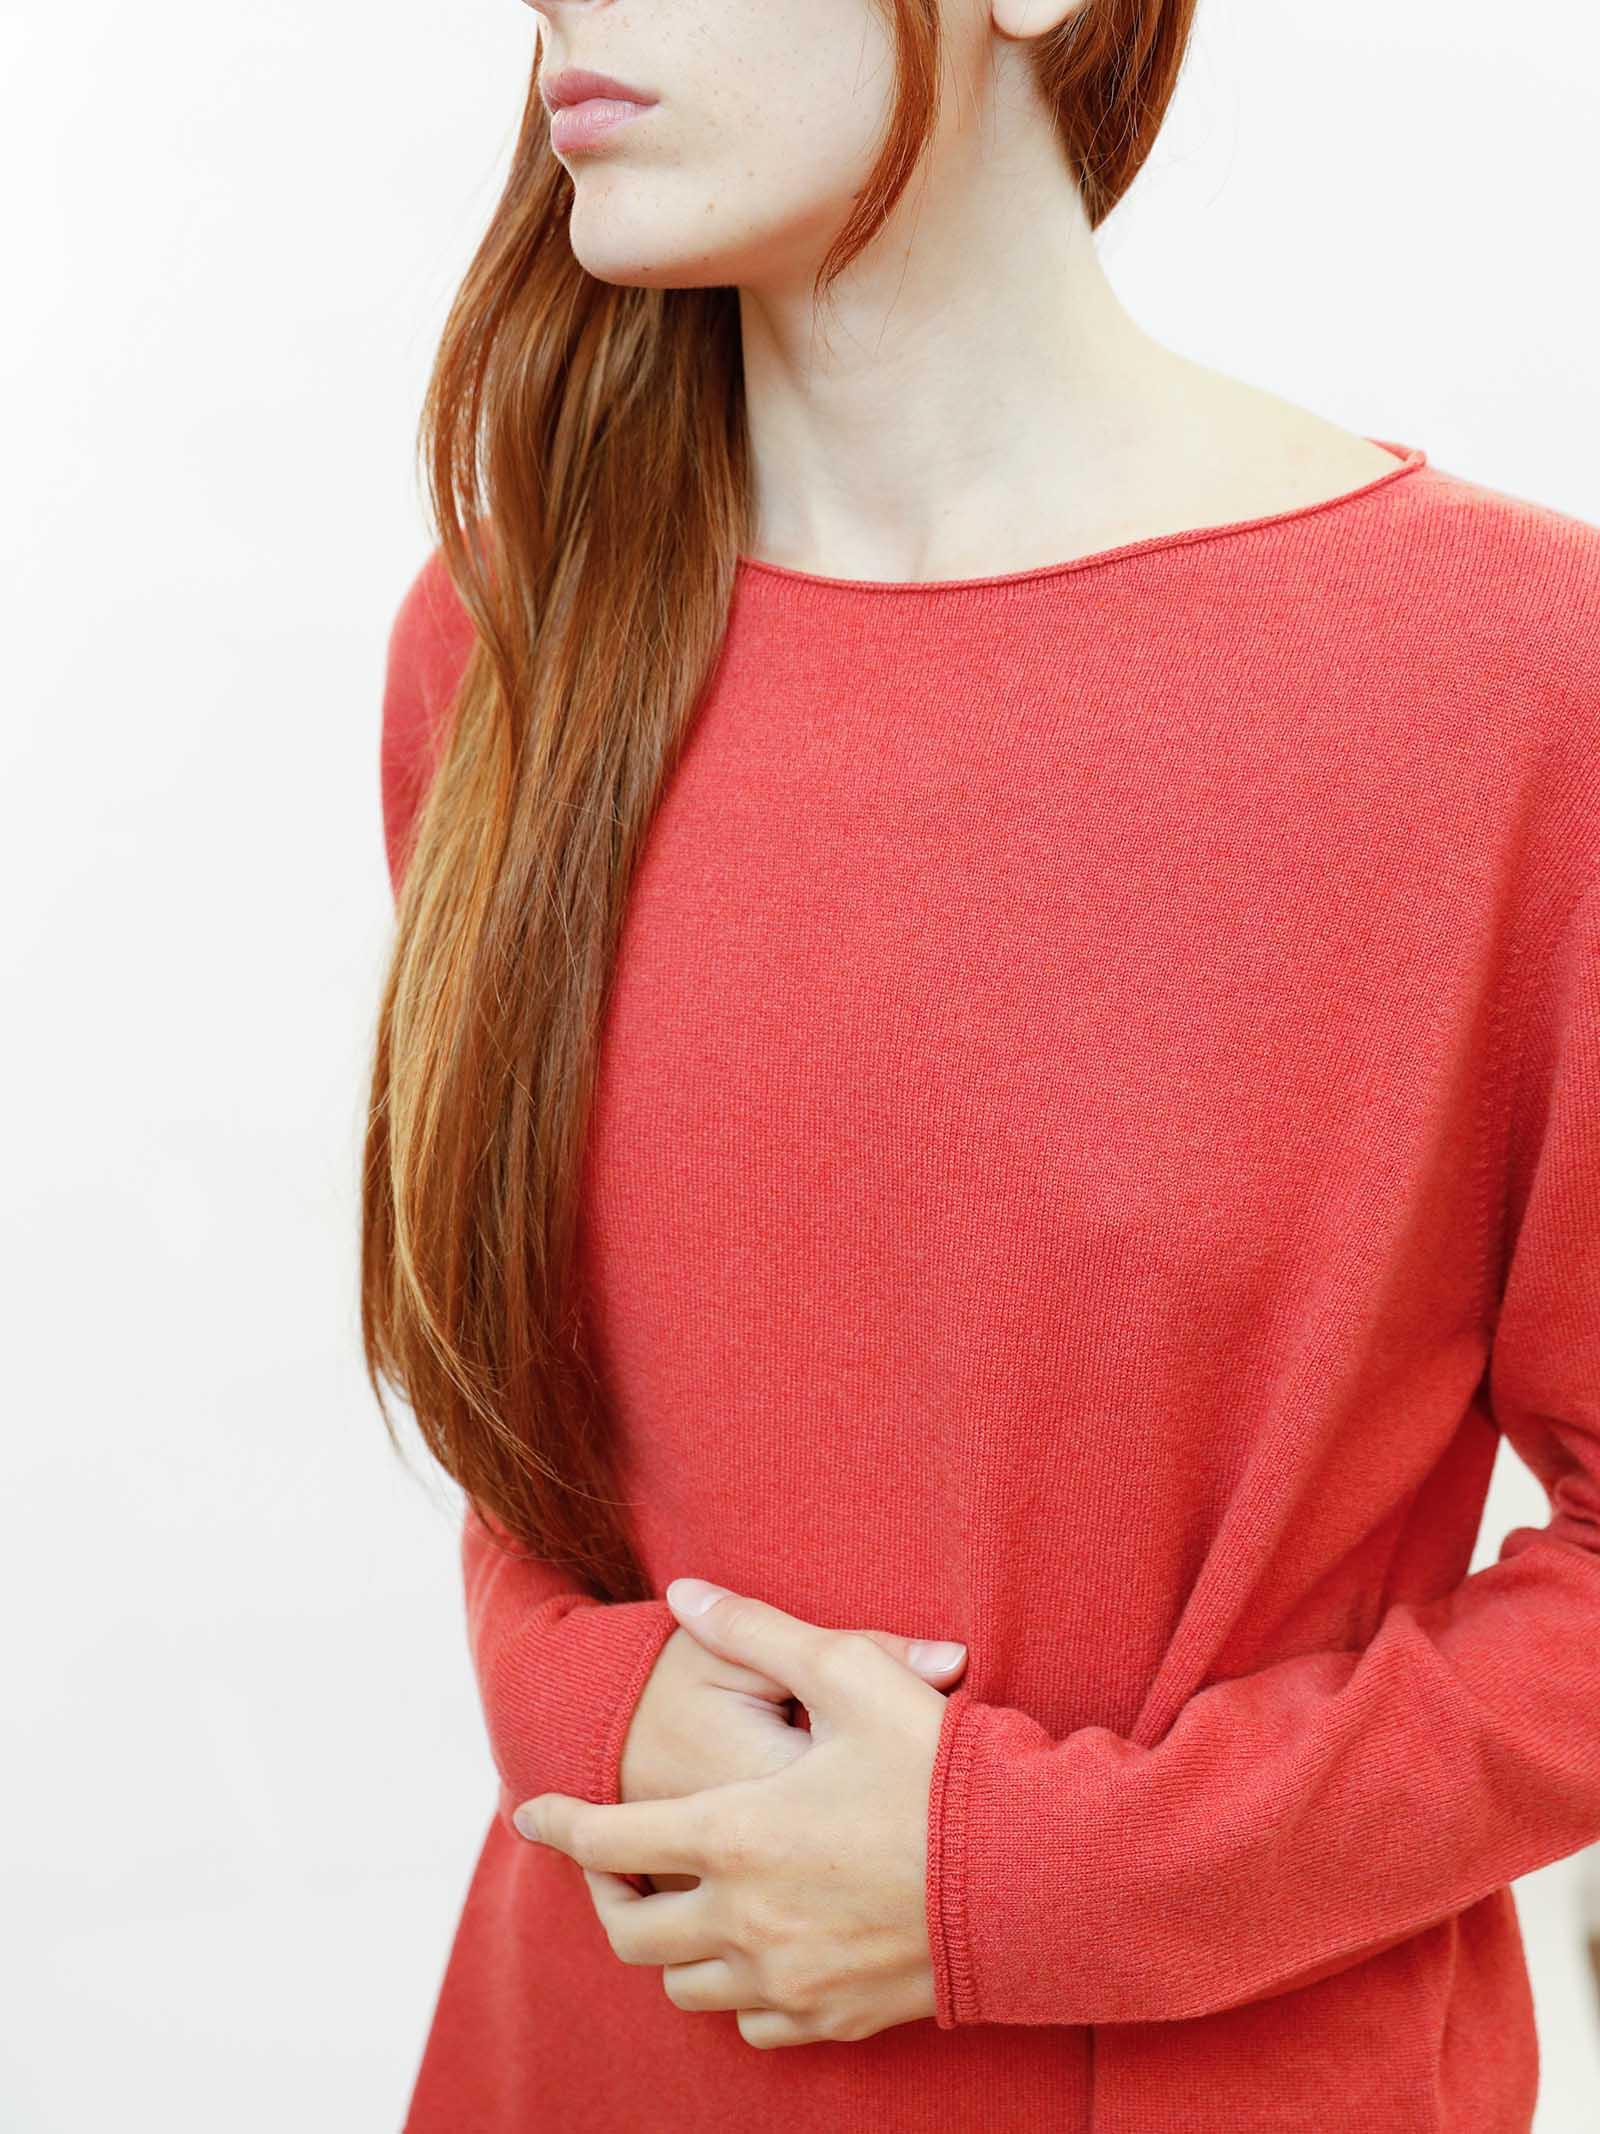 Women's Clothing Sweater in Rusty Wool & Cashmere with Wide Neckline Maliparmi   Knitwear   JQ48787425731038